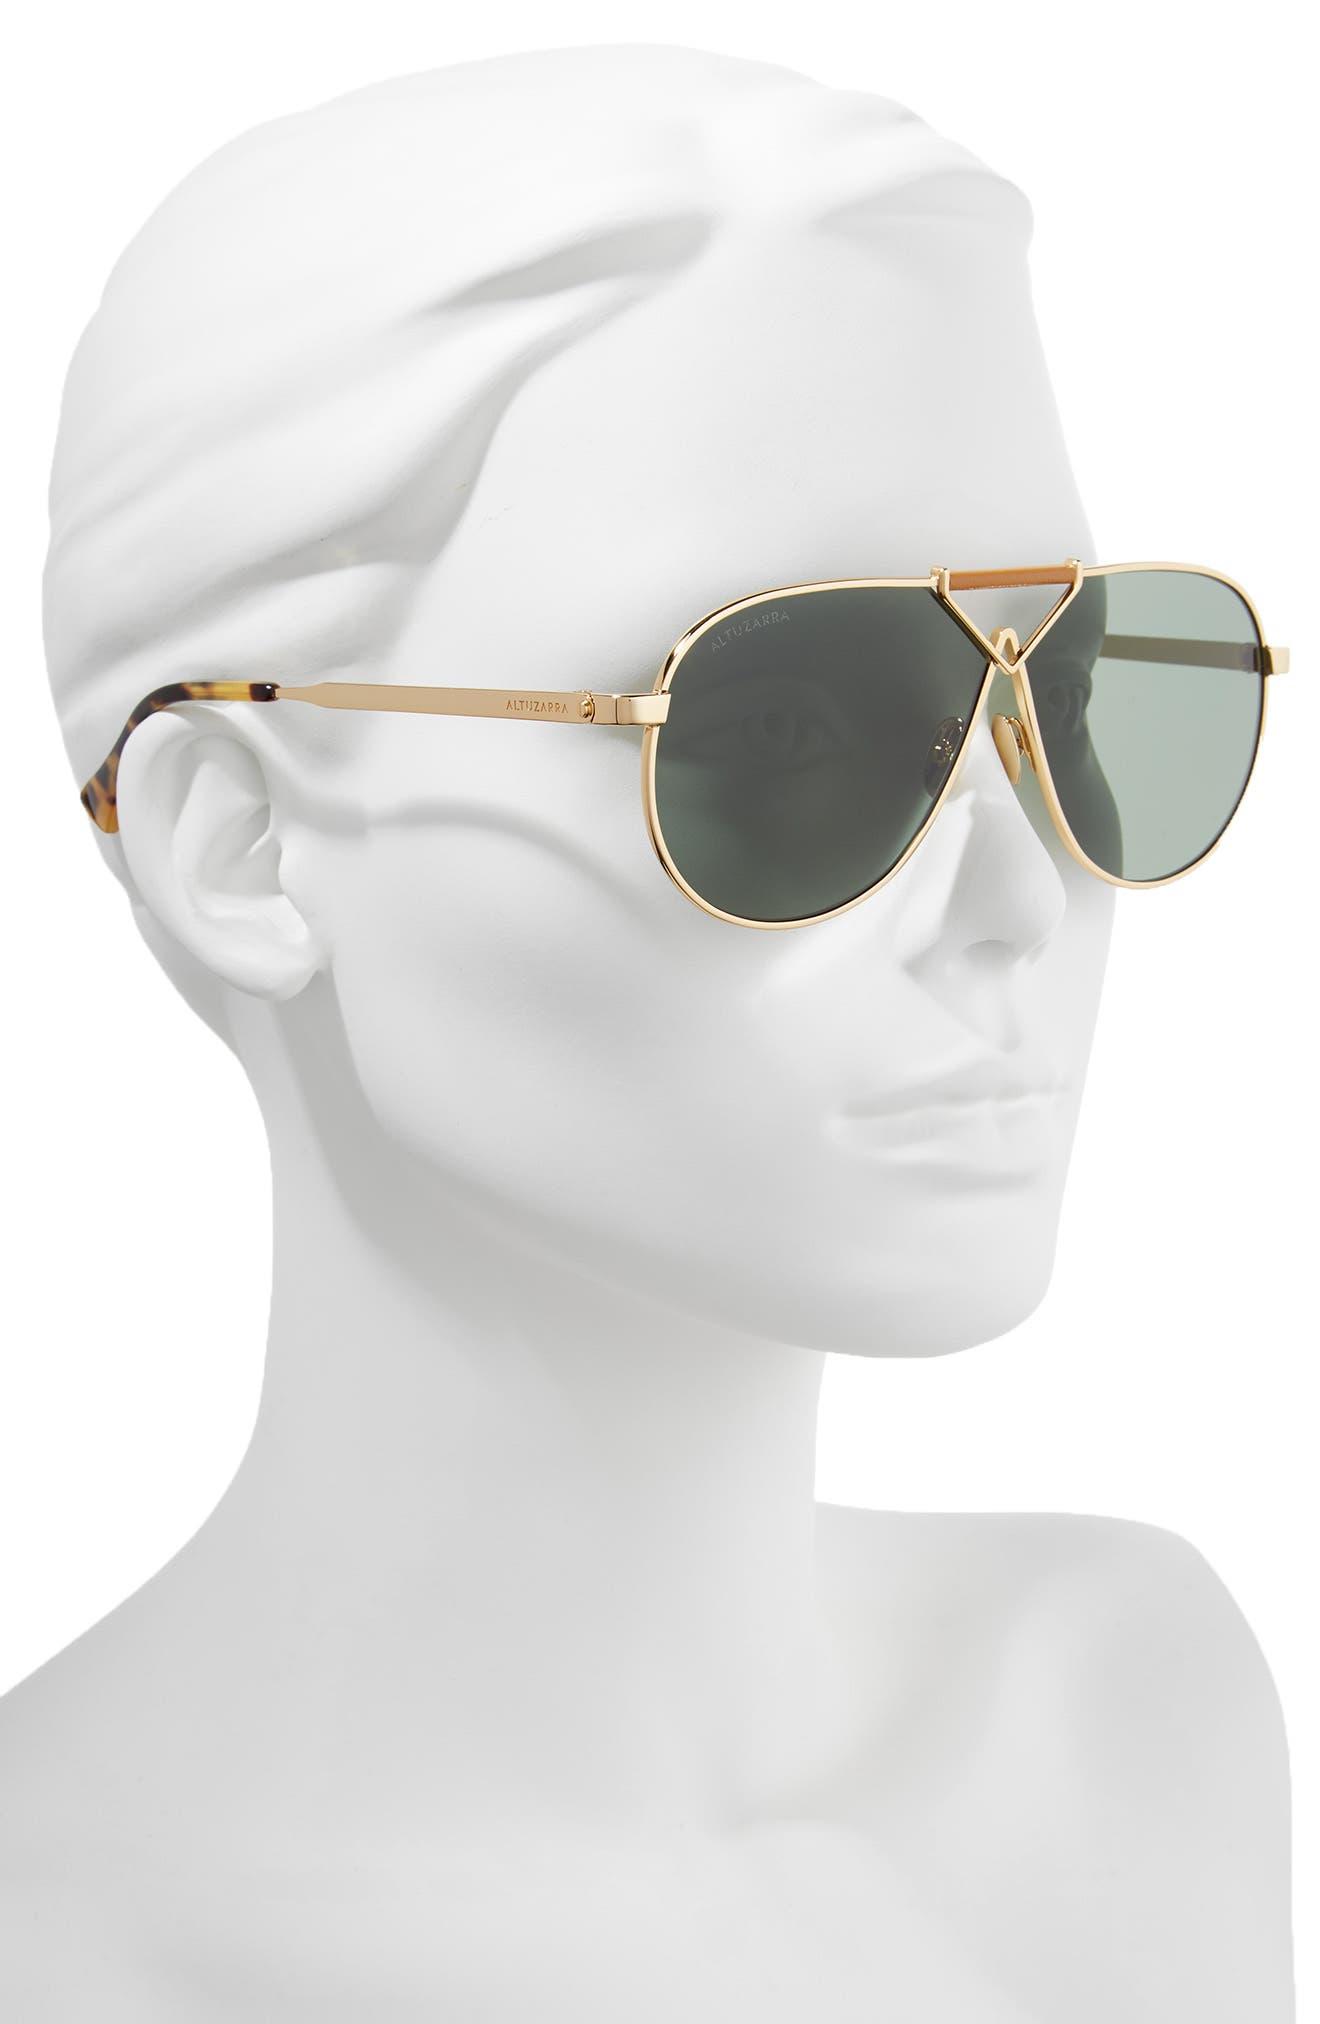 64mm Aviator Sunglasses,                             Alternate thumbnail 2, color,                             Gold